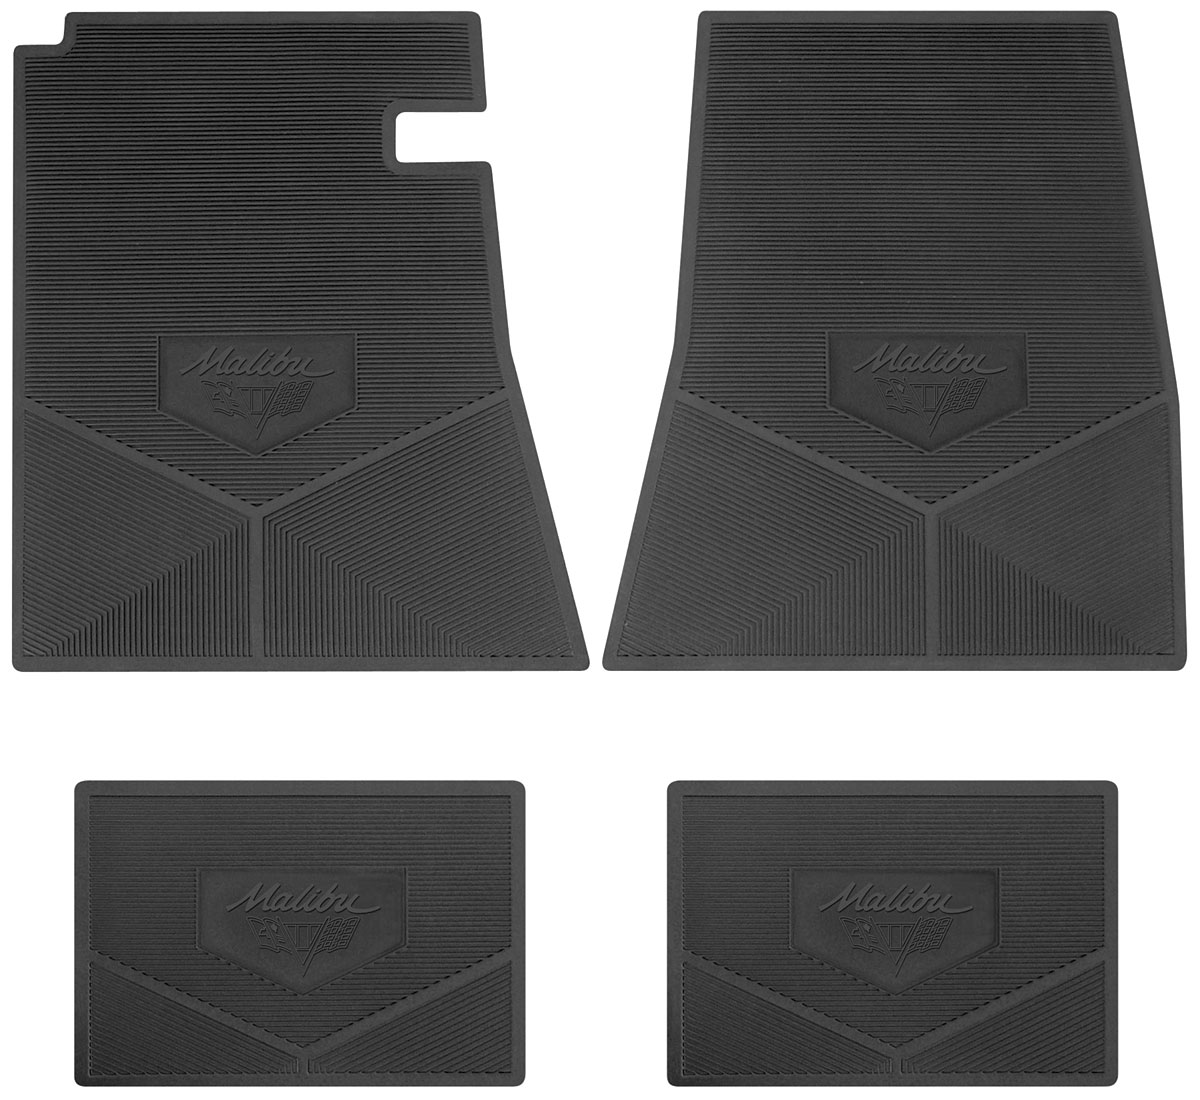 all firestone floor automotive mats fs heavy cars black amazon for weather dp com piece rubber duty